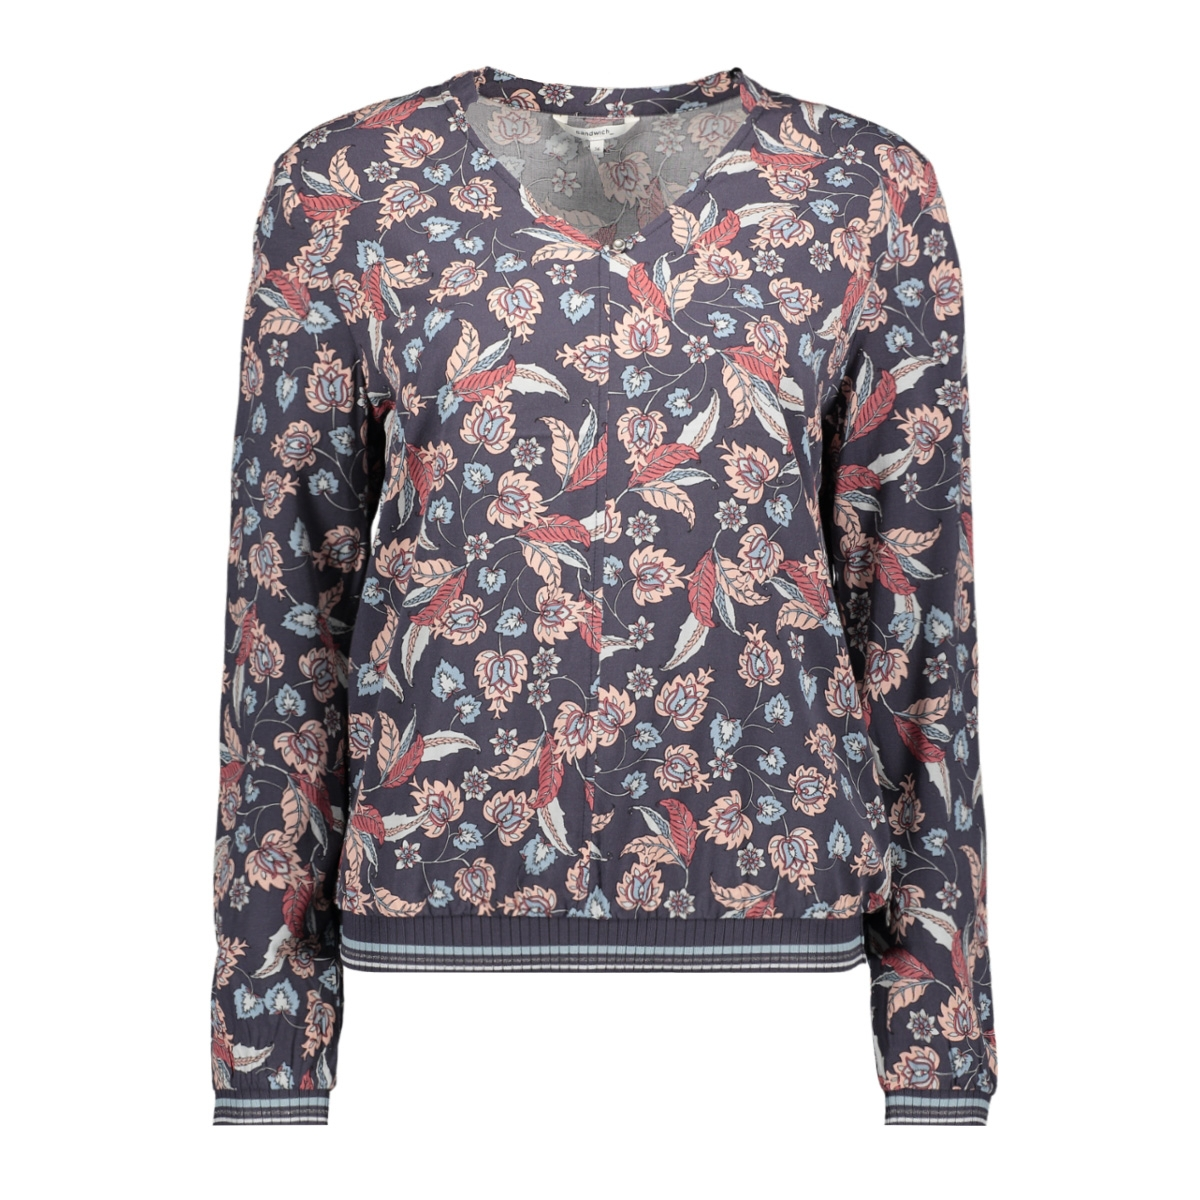 top met bloemenprint en ribboord 22001773 sandwich t-shirt 80027